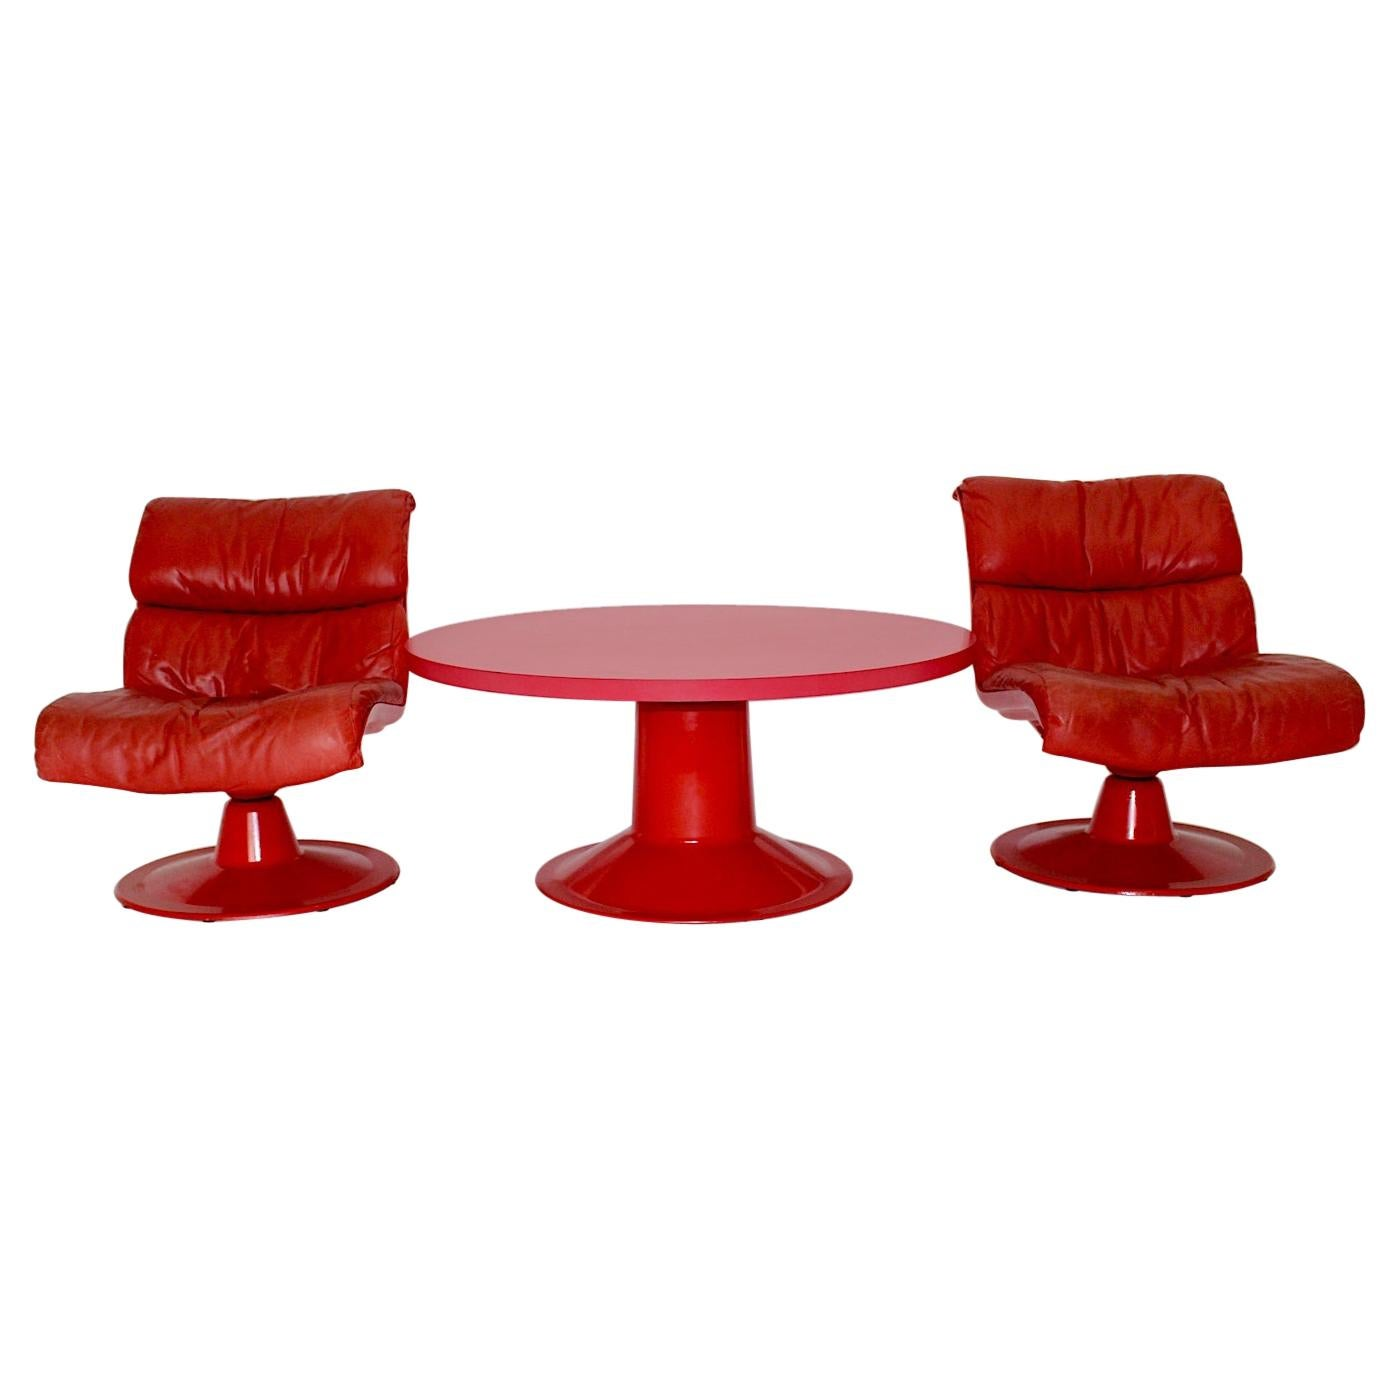 Space Age Red Vintage Lounge Chairs Saturn Pink Sofa Table Yrjö Kukkapuro, 1960s